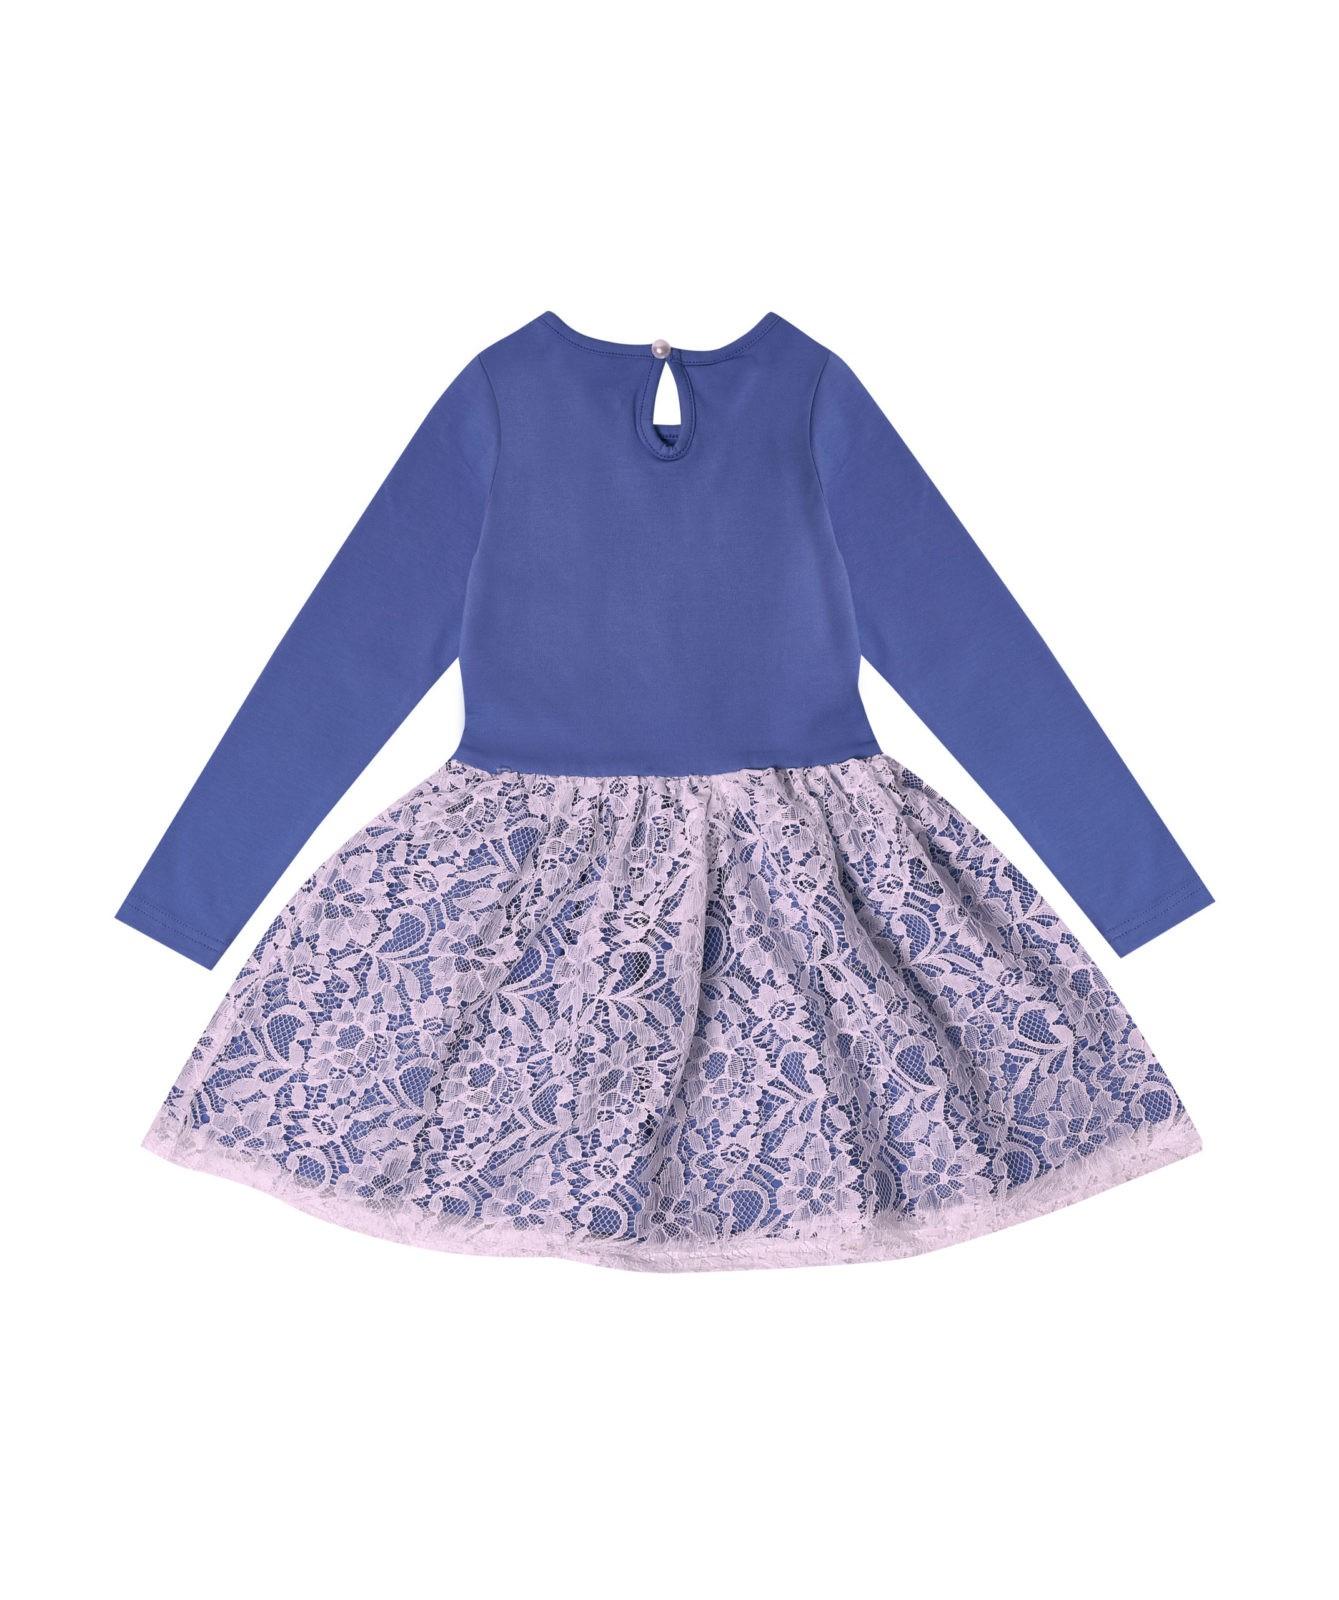 Dívčí šaty Beautiful Modrá/Bílá